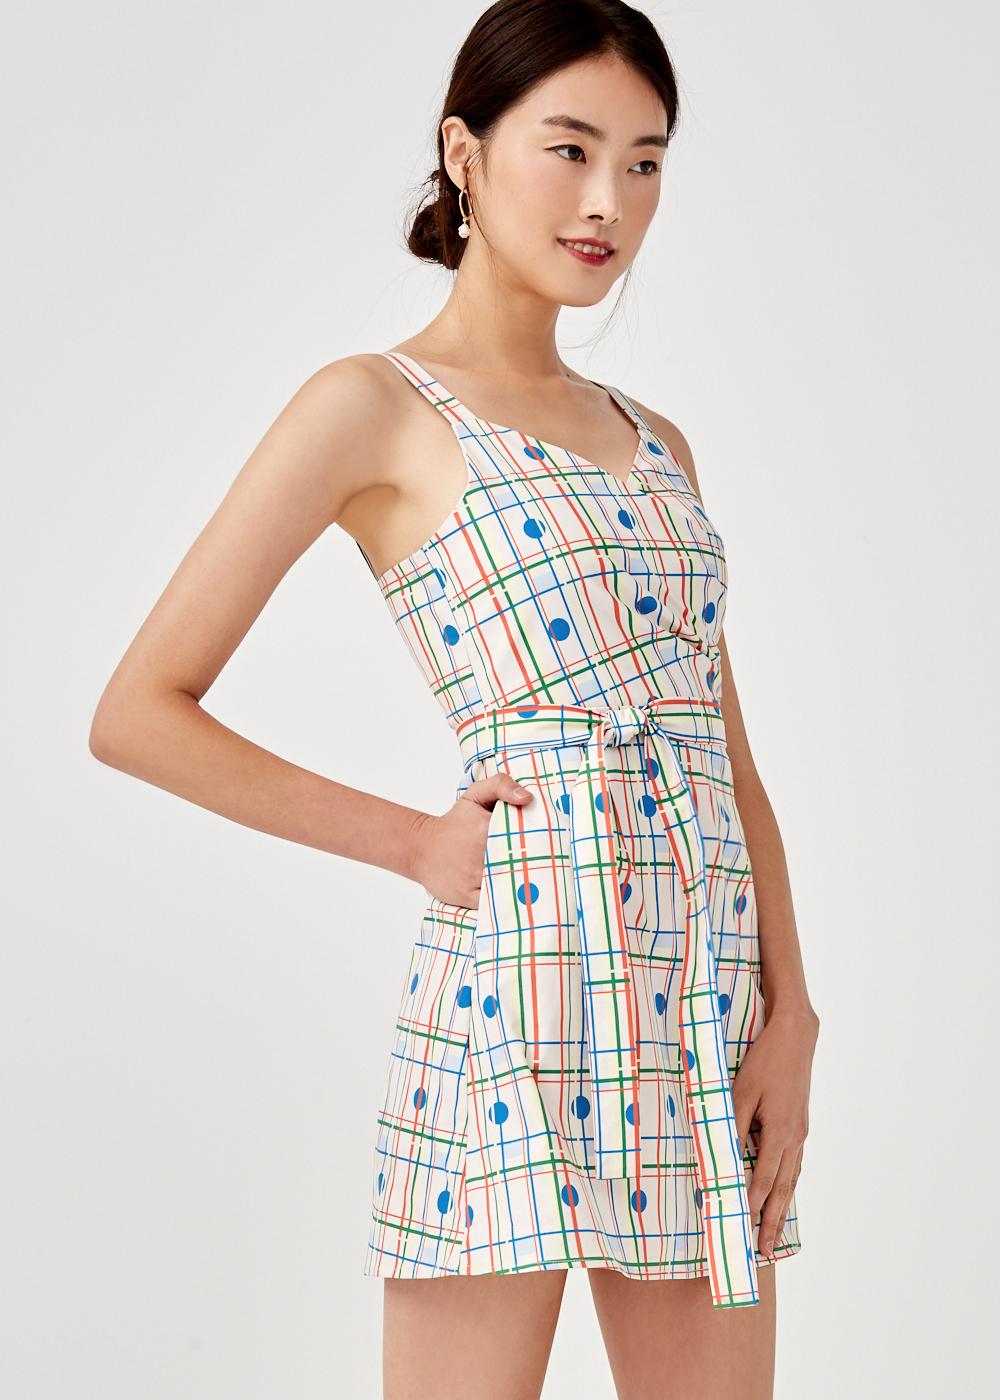 Adaline Crossover Sash Tie Dress in Rainbow Tile